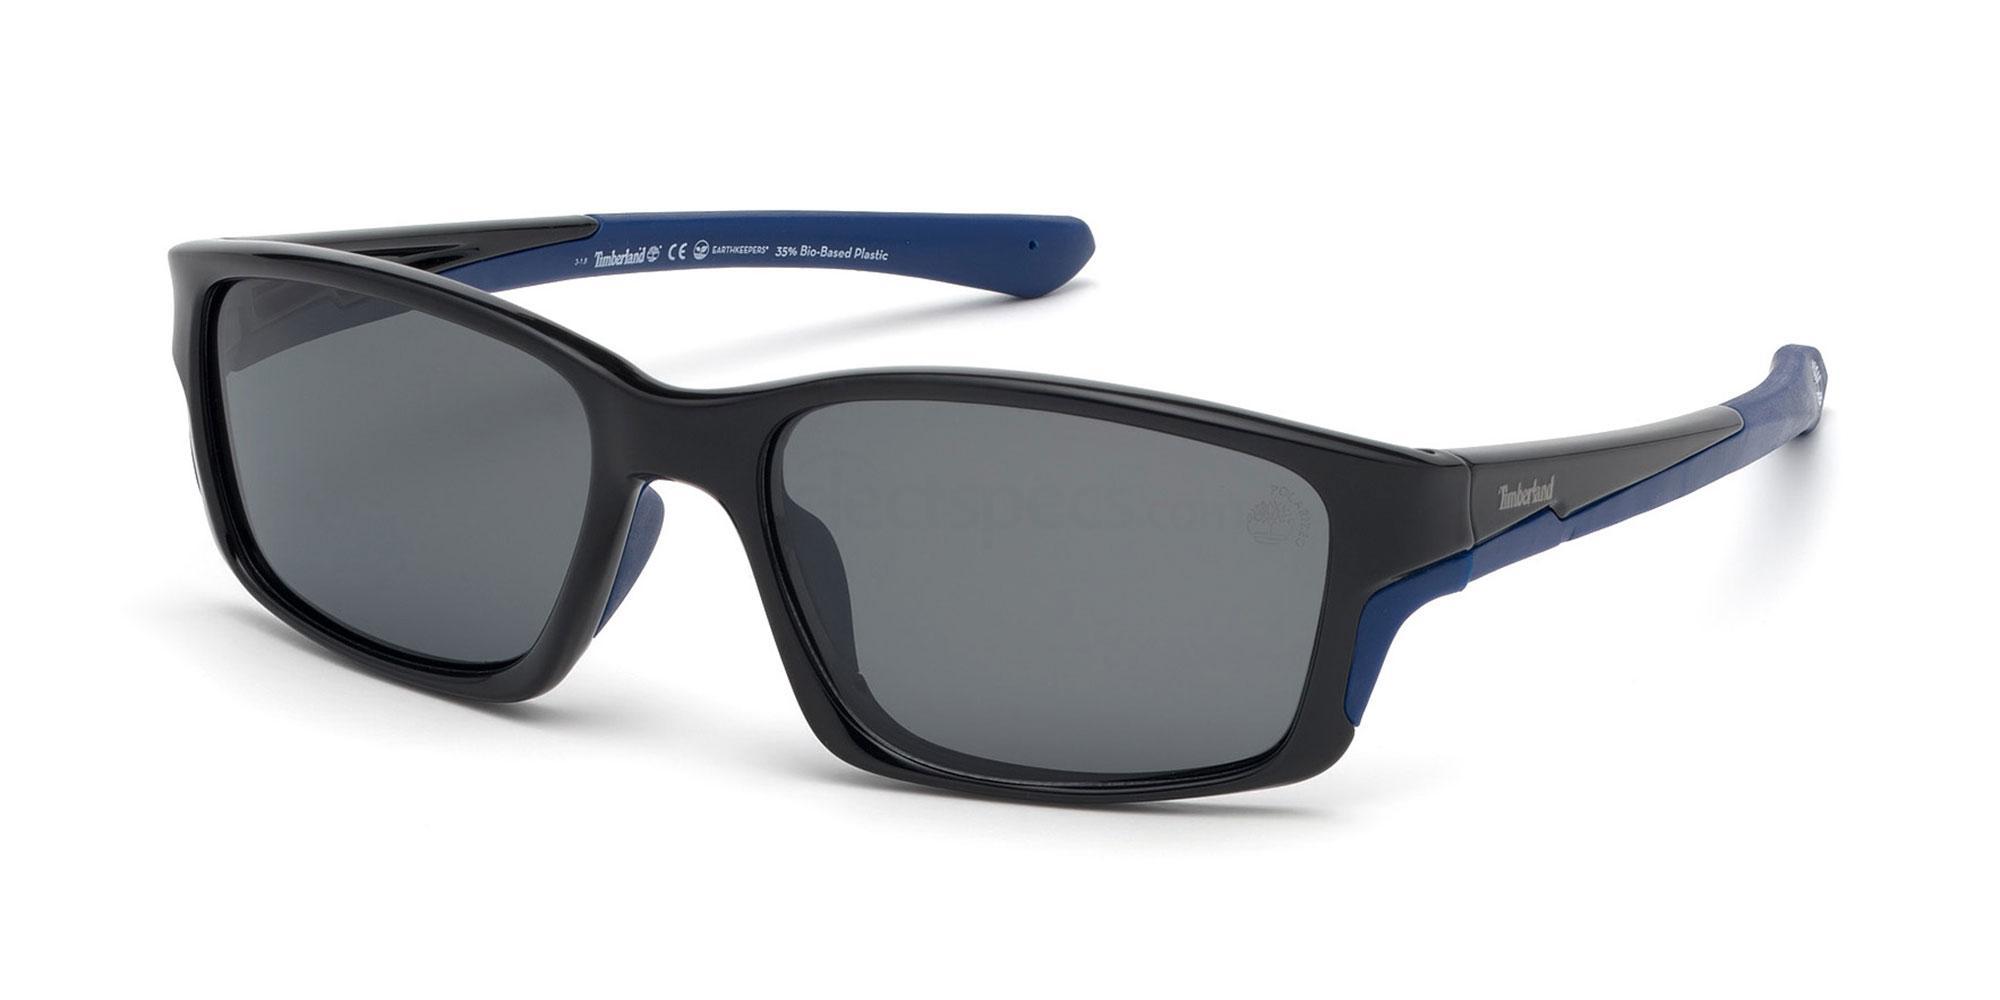 01D TB9172 Sunglasses, Timberland